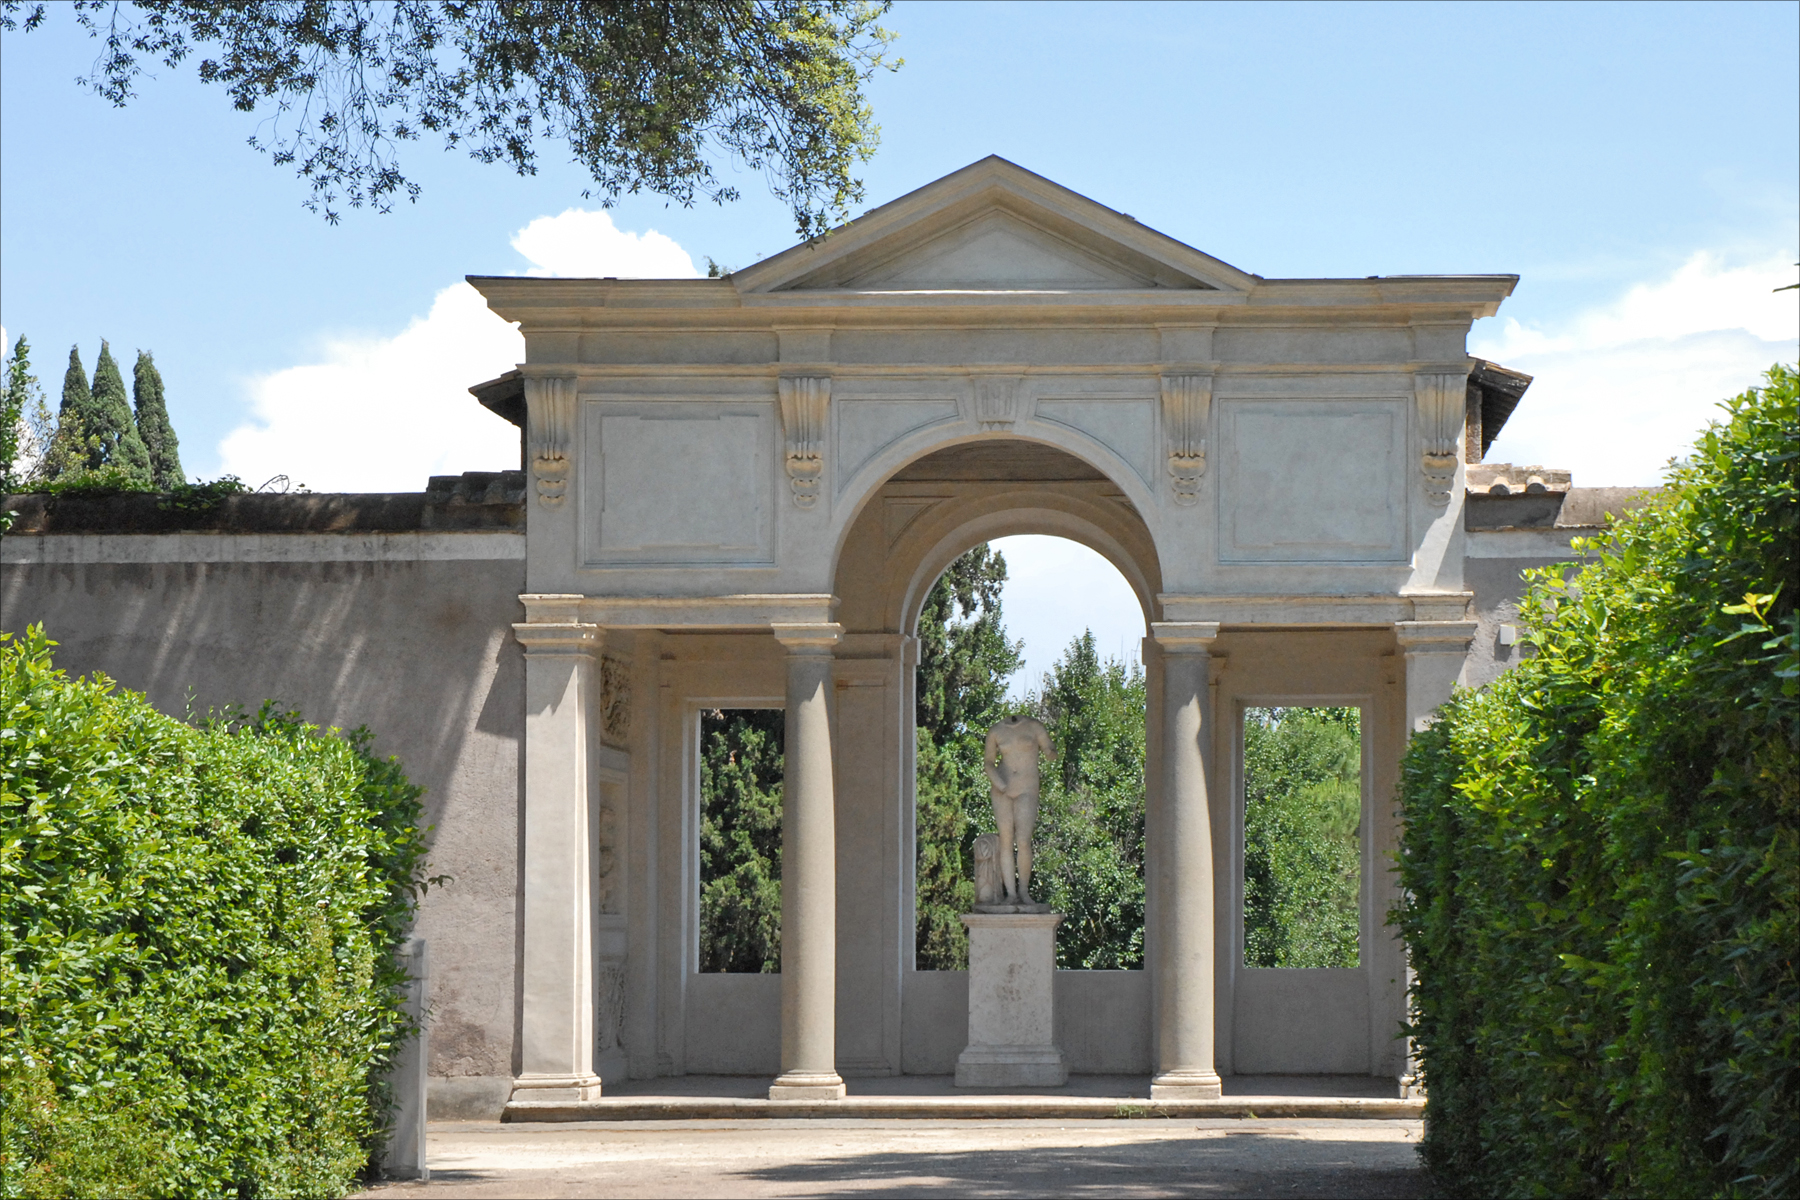 File la loggia dite de cl opatre dans le jardin de la for Jardin villa medicis rome